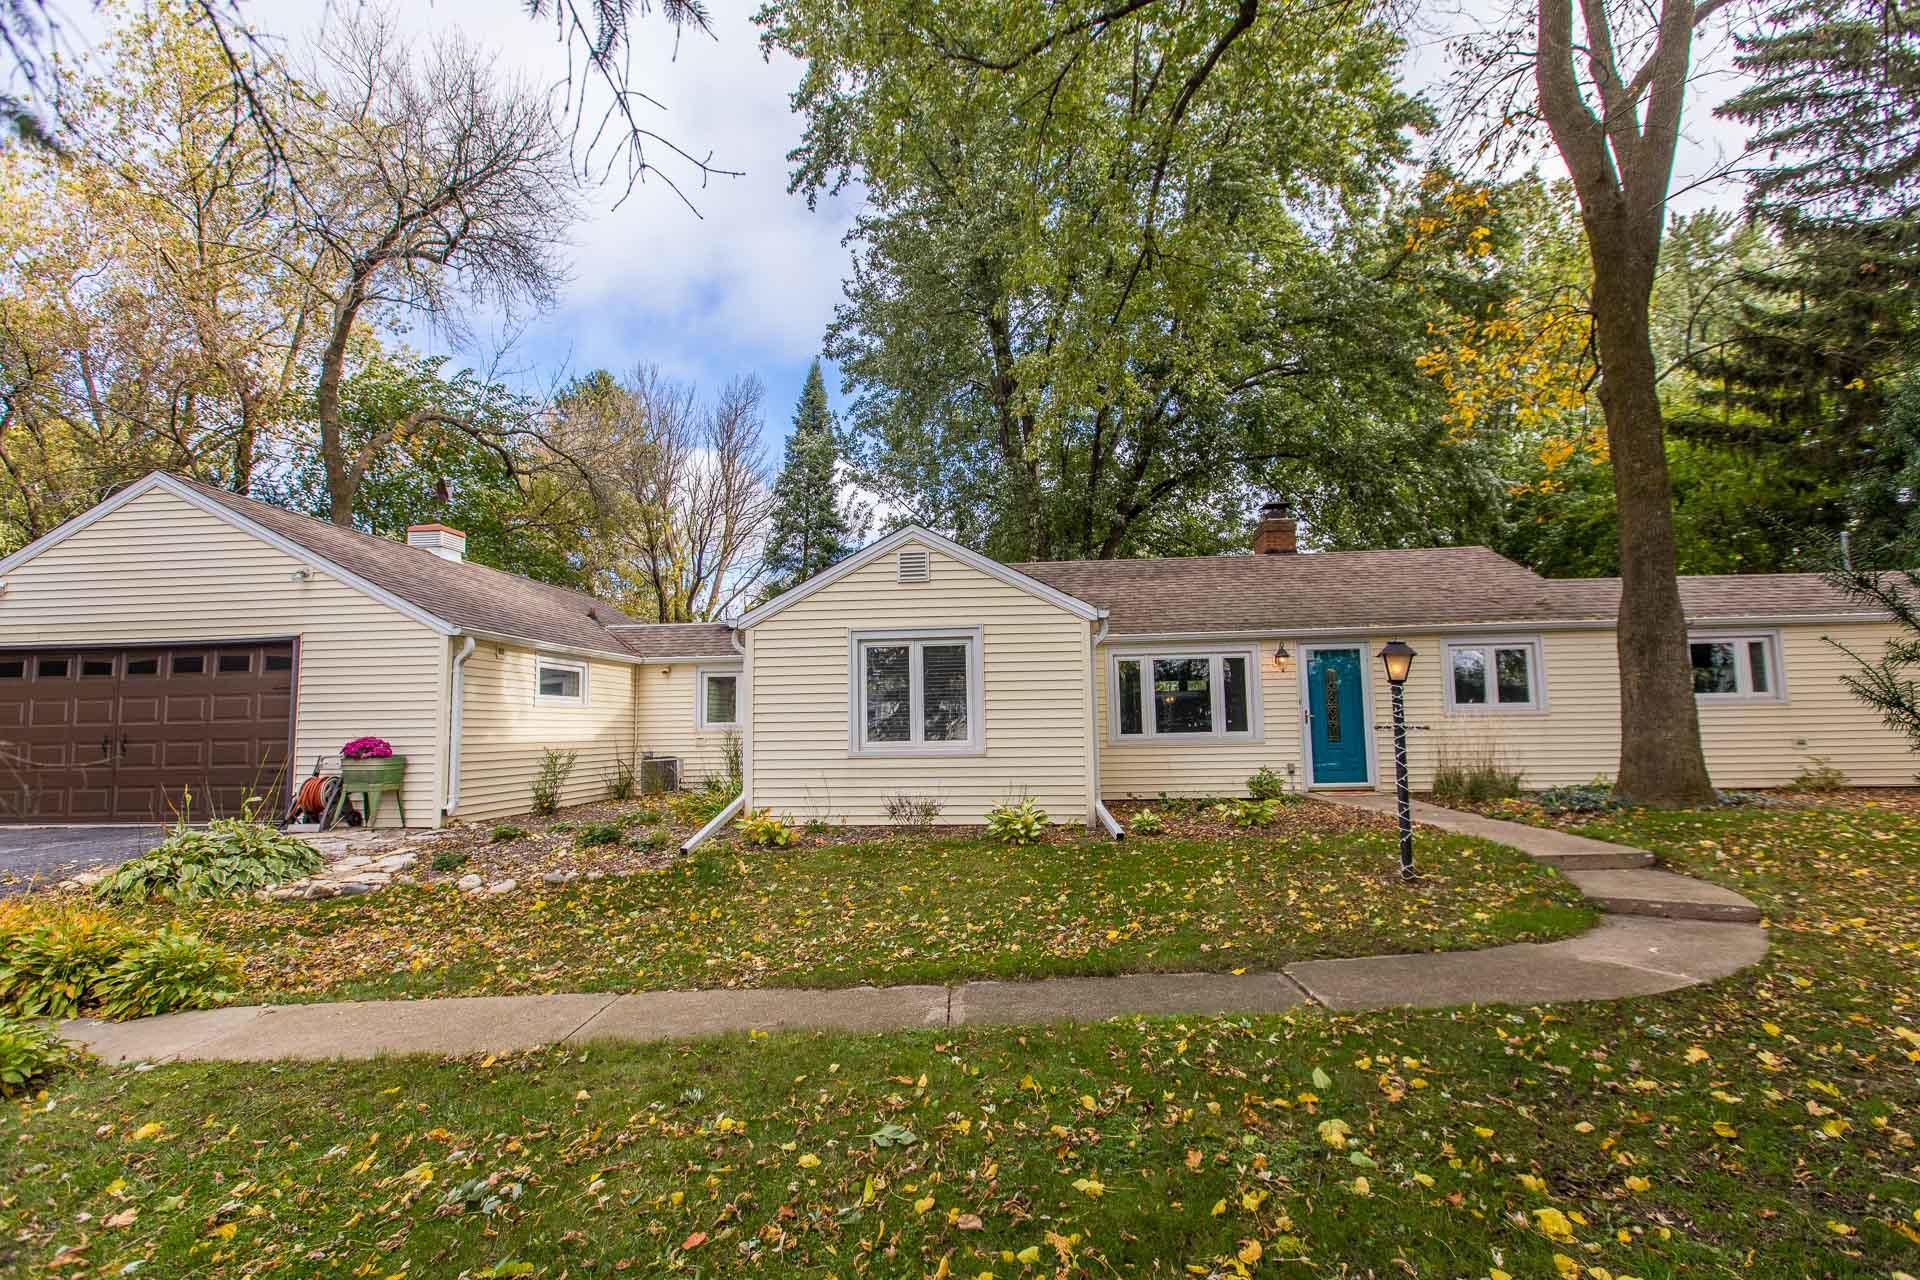 N56W39334 Wisconsin Ave, Oconomowoc, Wisconsin 53066, 4 Bedrooms Bedrooms, 8 Rooms Rooms,2 BathroomsBathrooms,Single-Family,For Sale,Wisconsin Ave,1609475